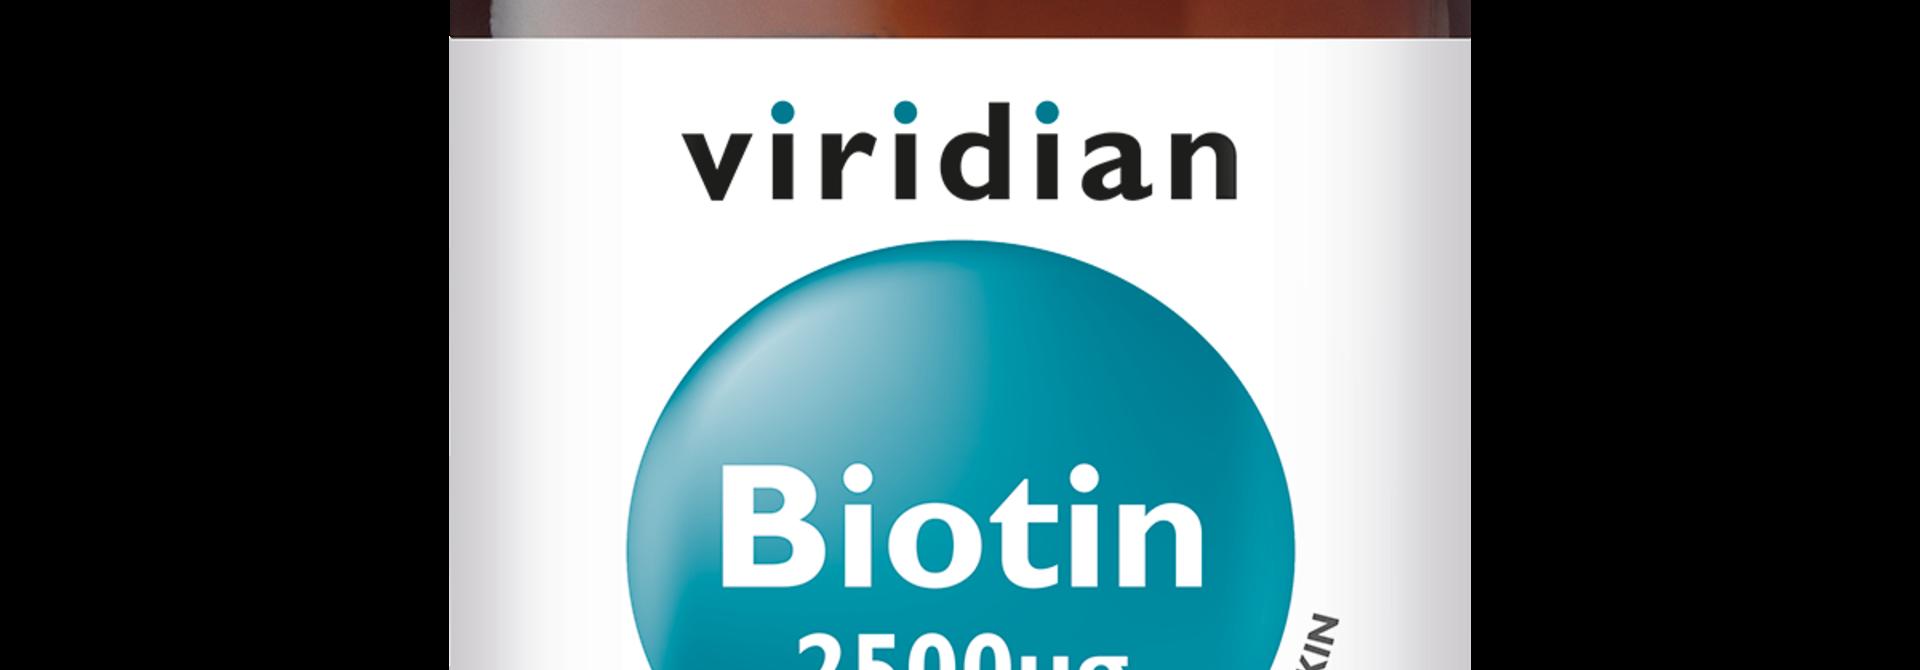 Biotin 2500 mcg 90 plantaardige capsules